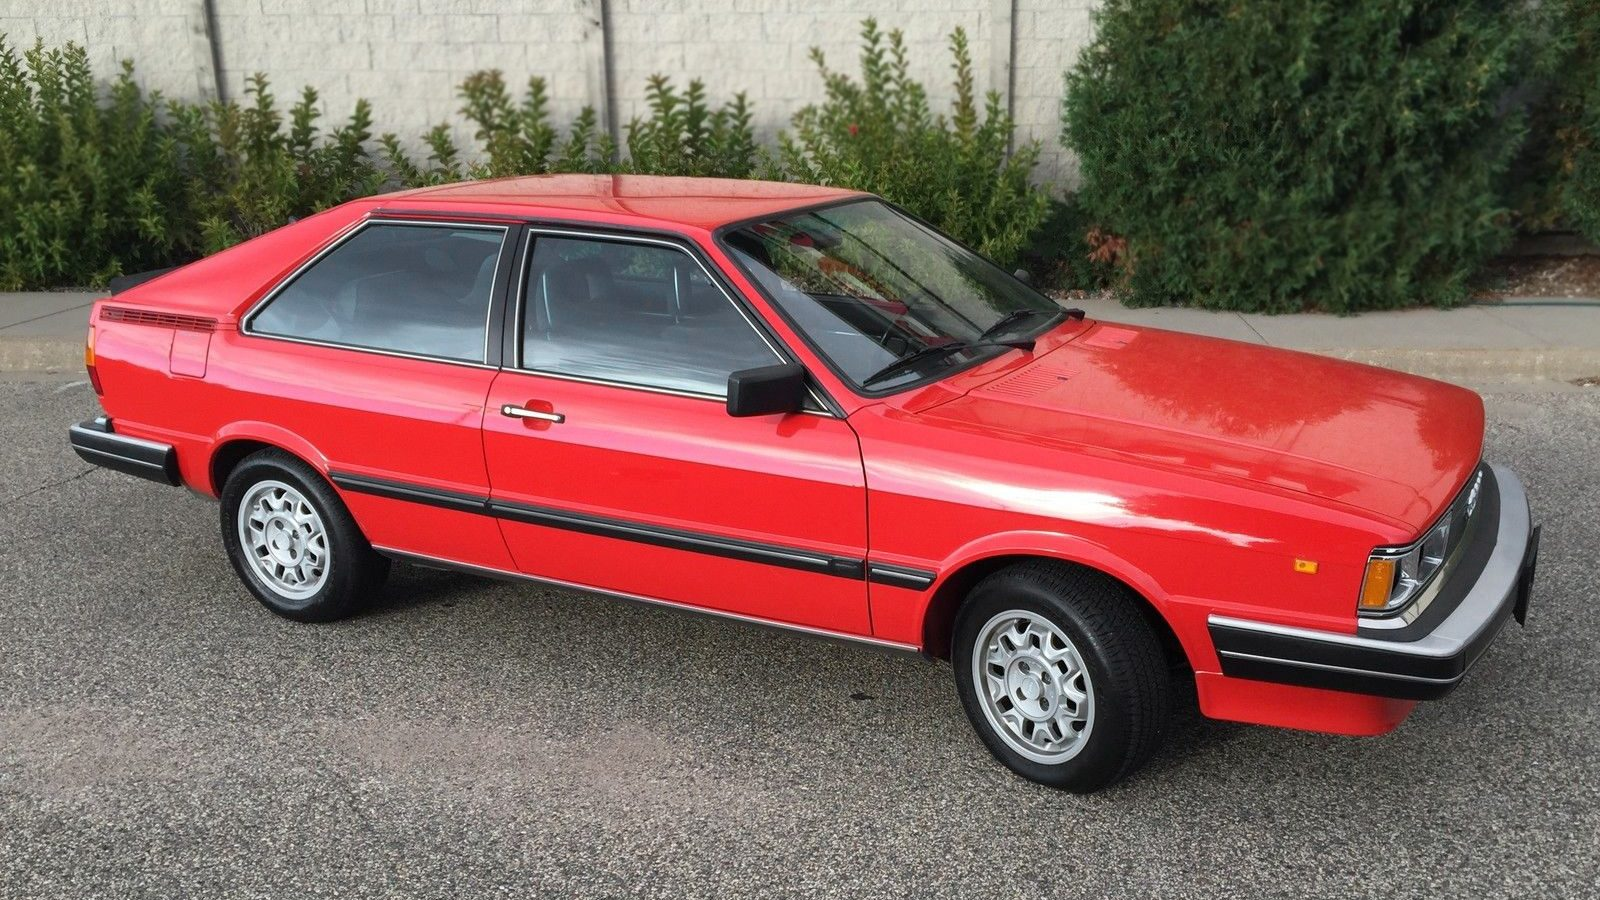 Audi Coupe GT 1982 barnfinds com  092116-Barn-Finds-1982-Audi-Coupe-GT-1-e1474471680673